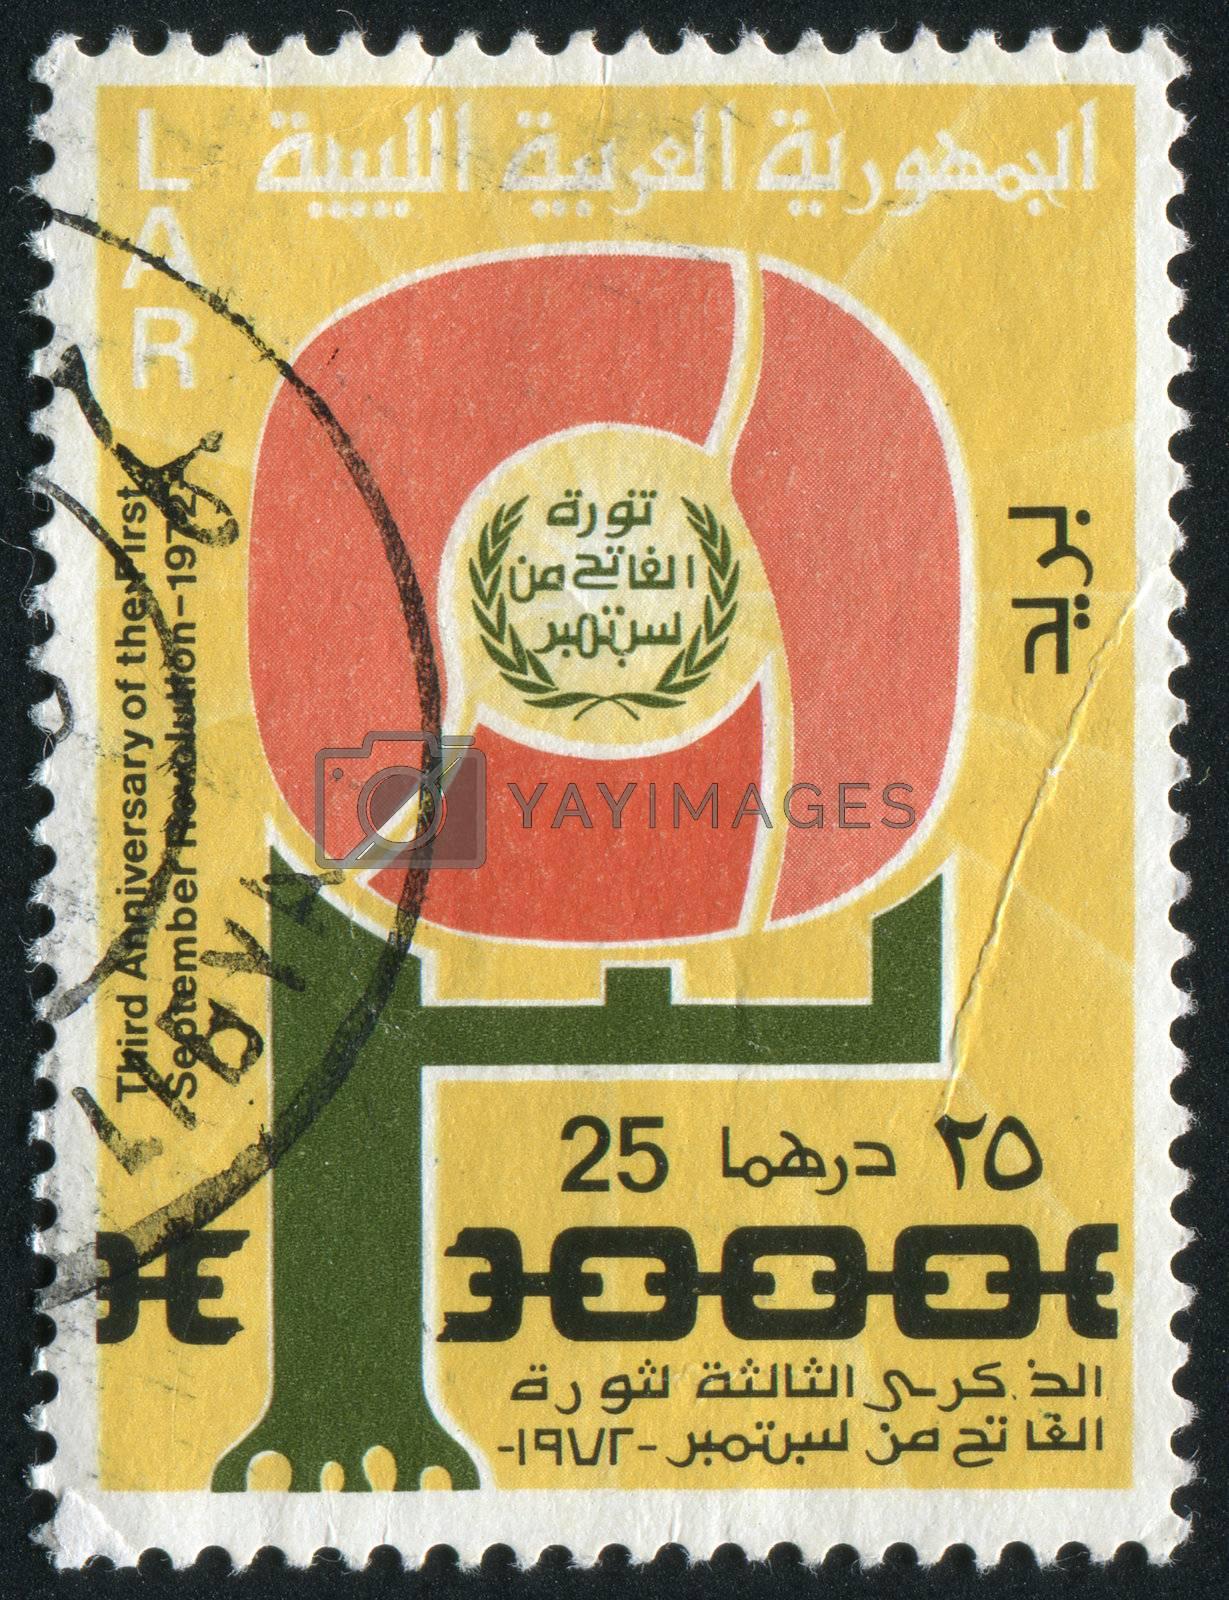 LIBYA  - CIRCA 1972: Emblem and Broken Chain, circa 1972.